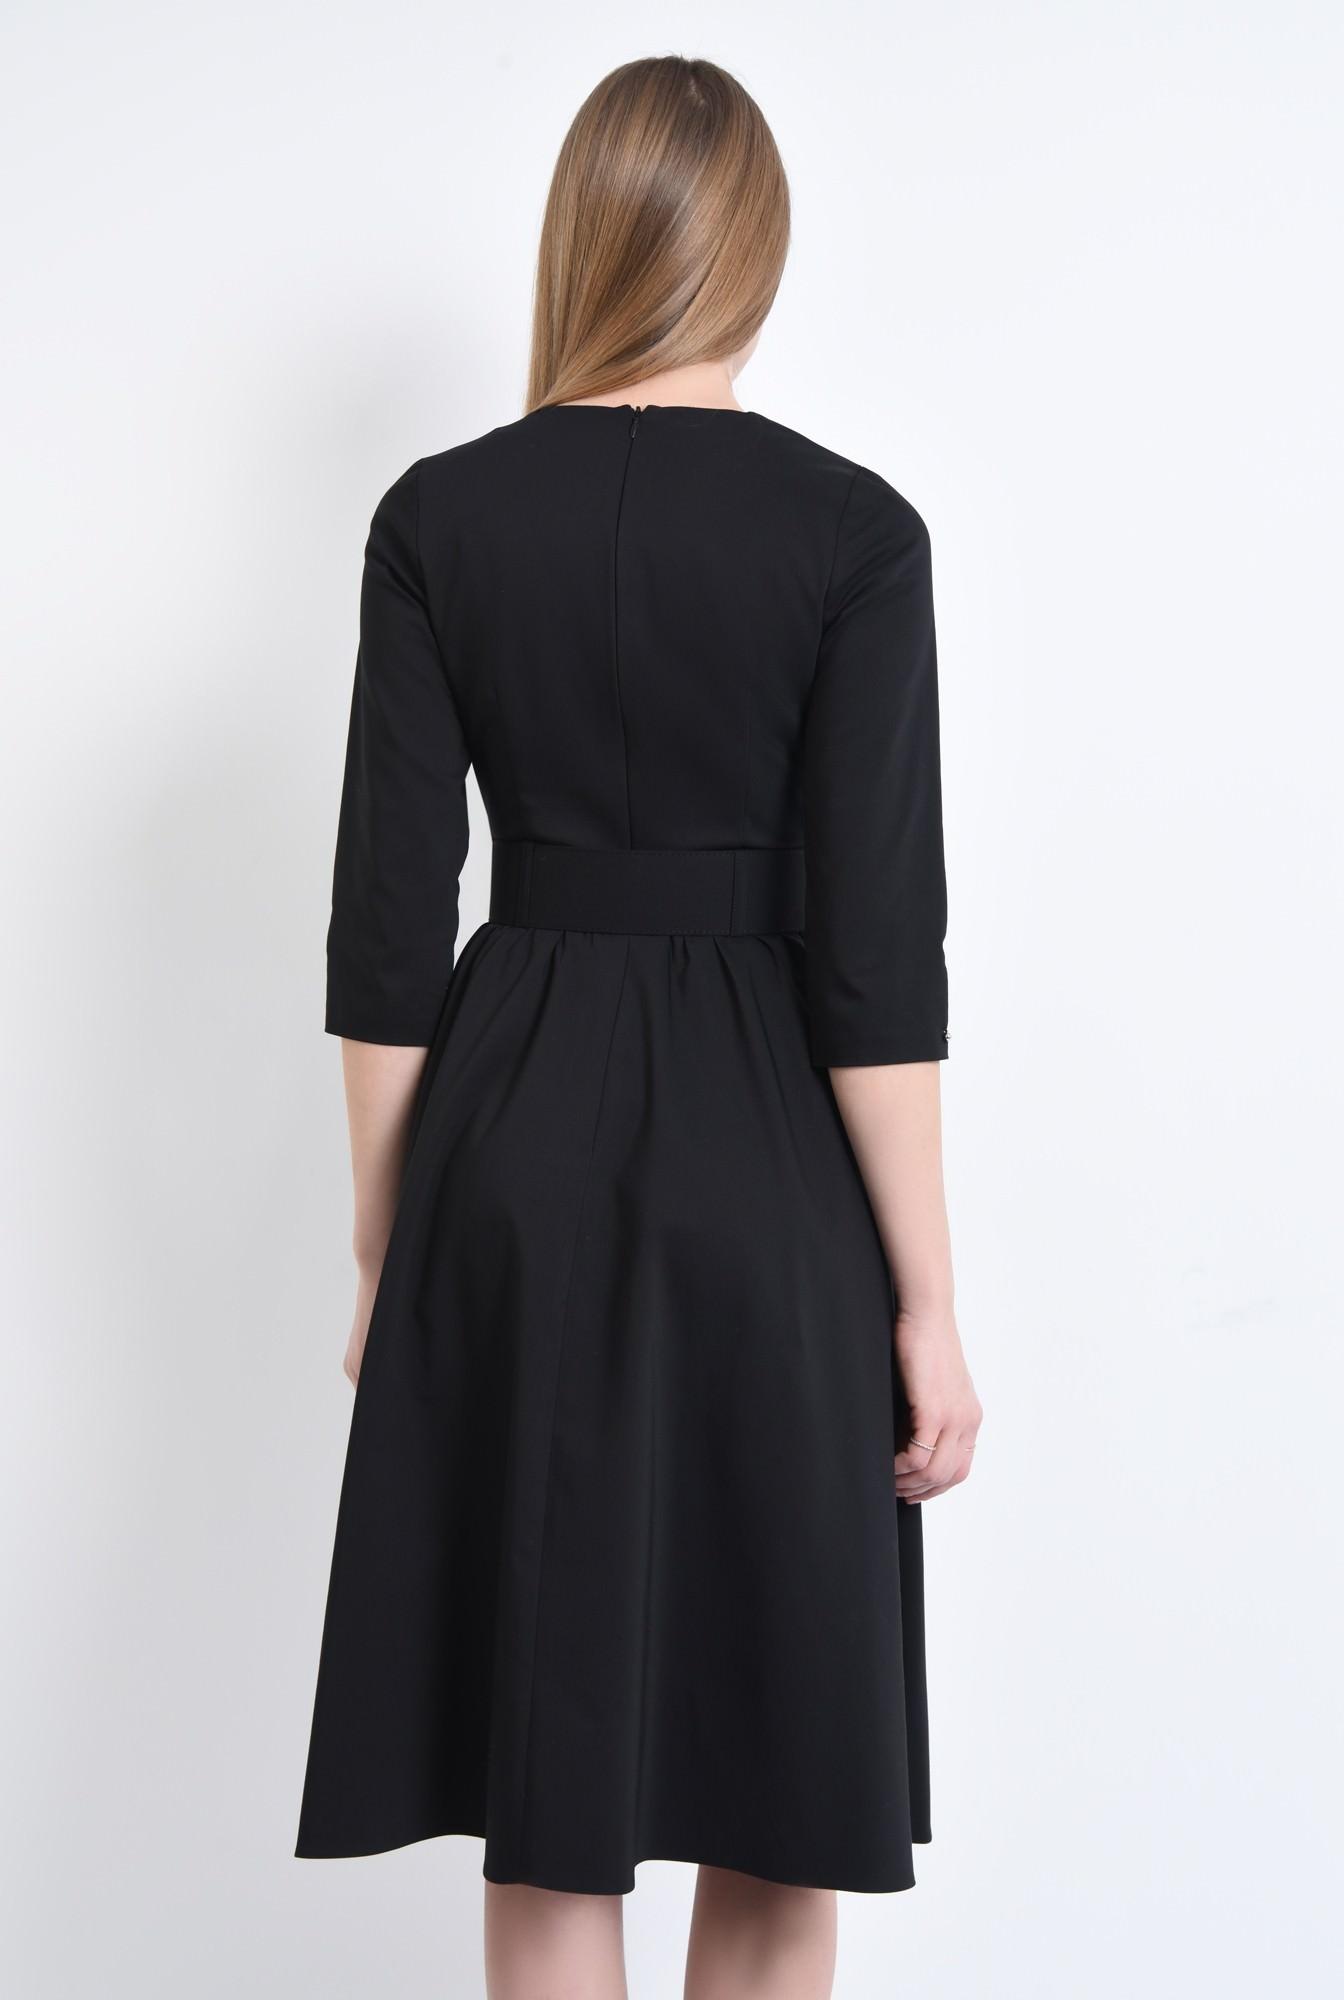 1 - 360 - Rochie casual, centura material textil